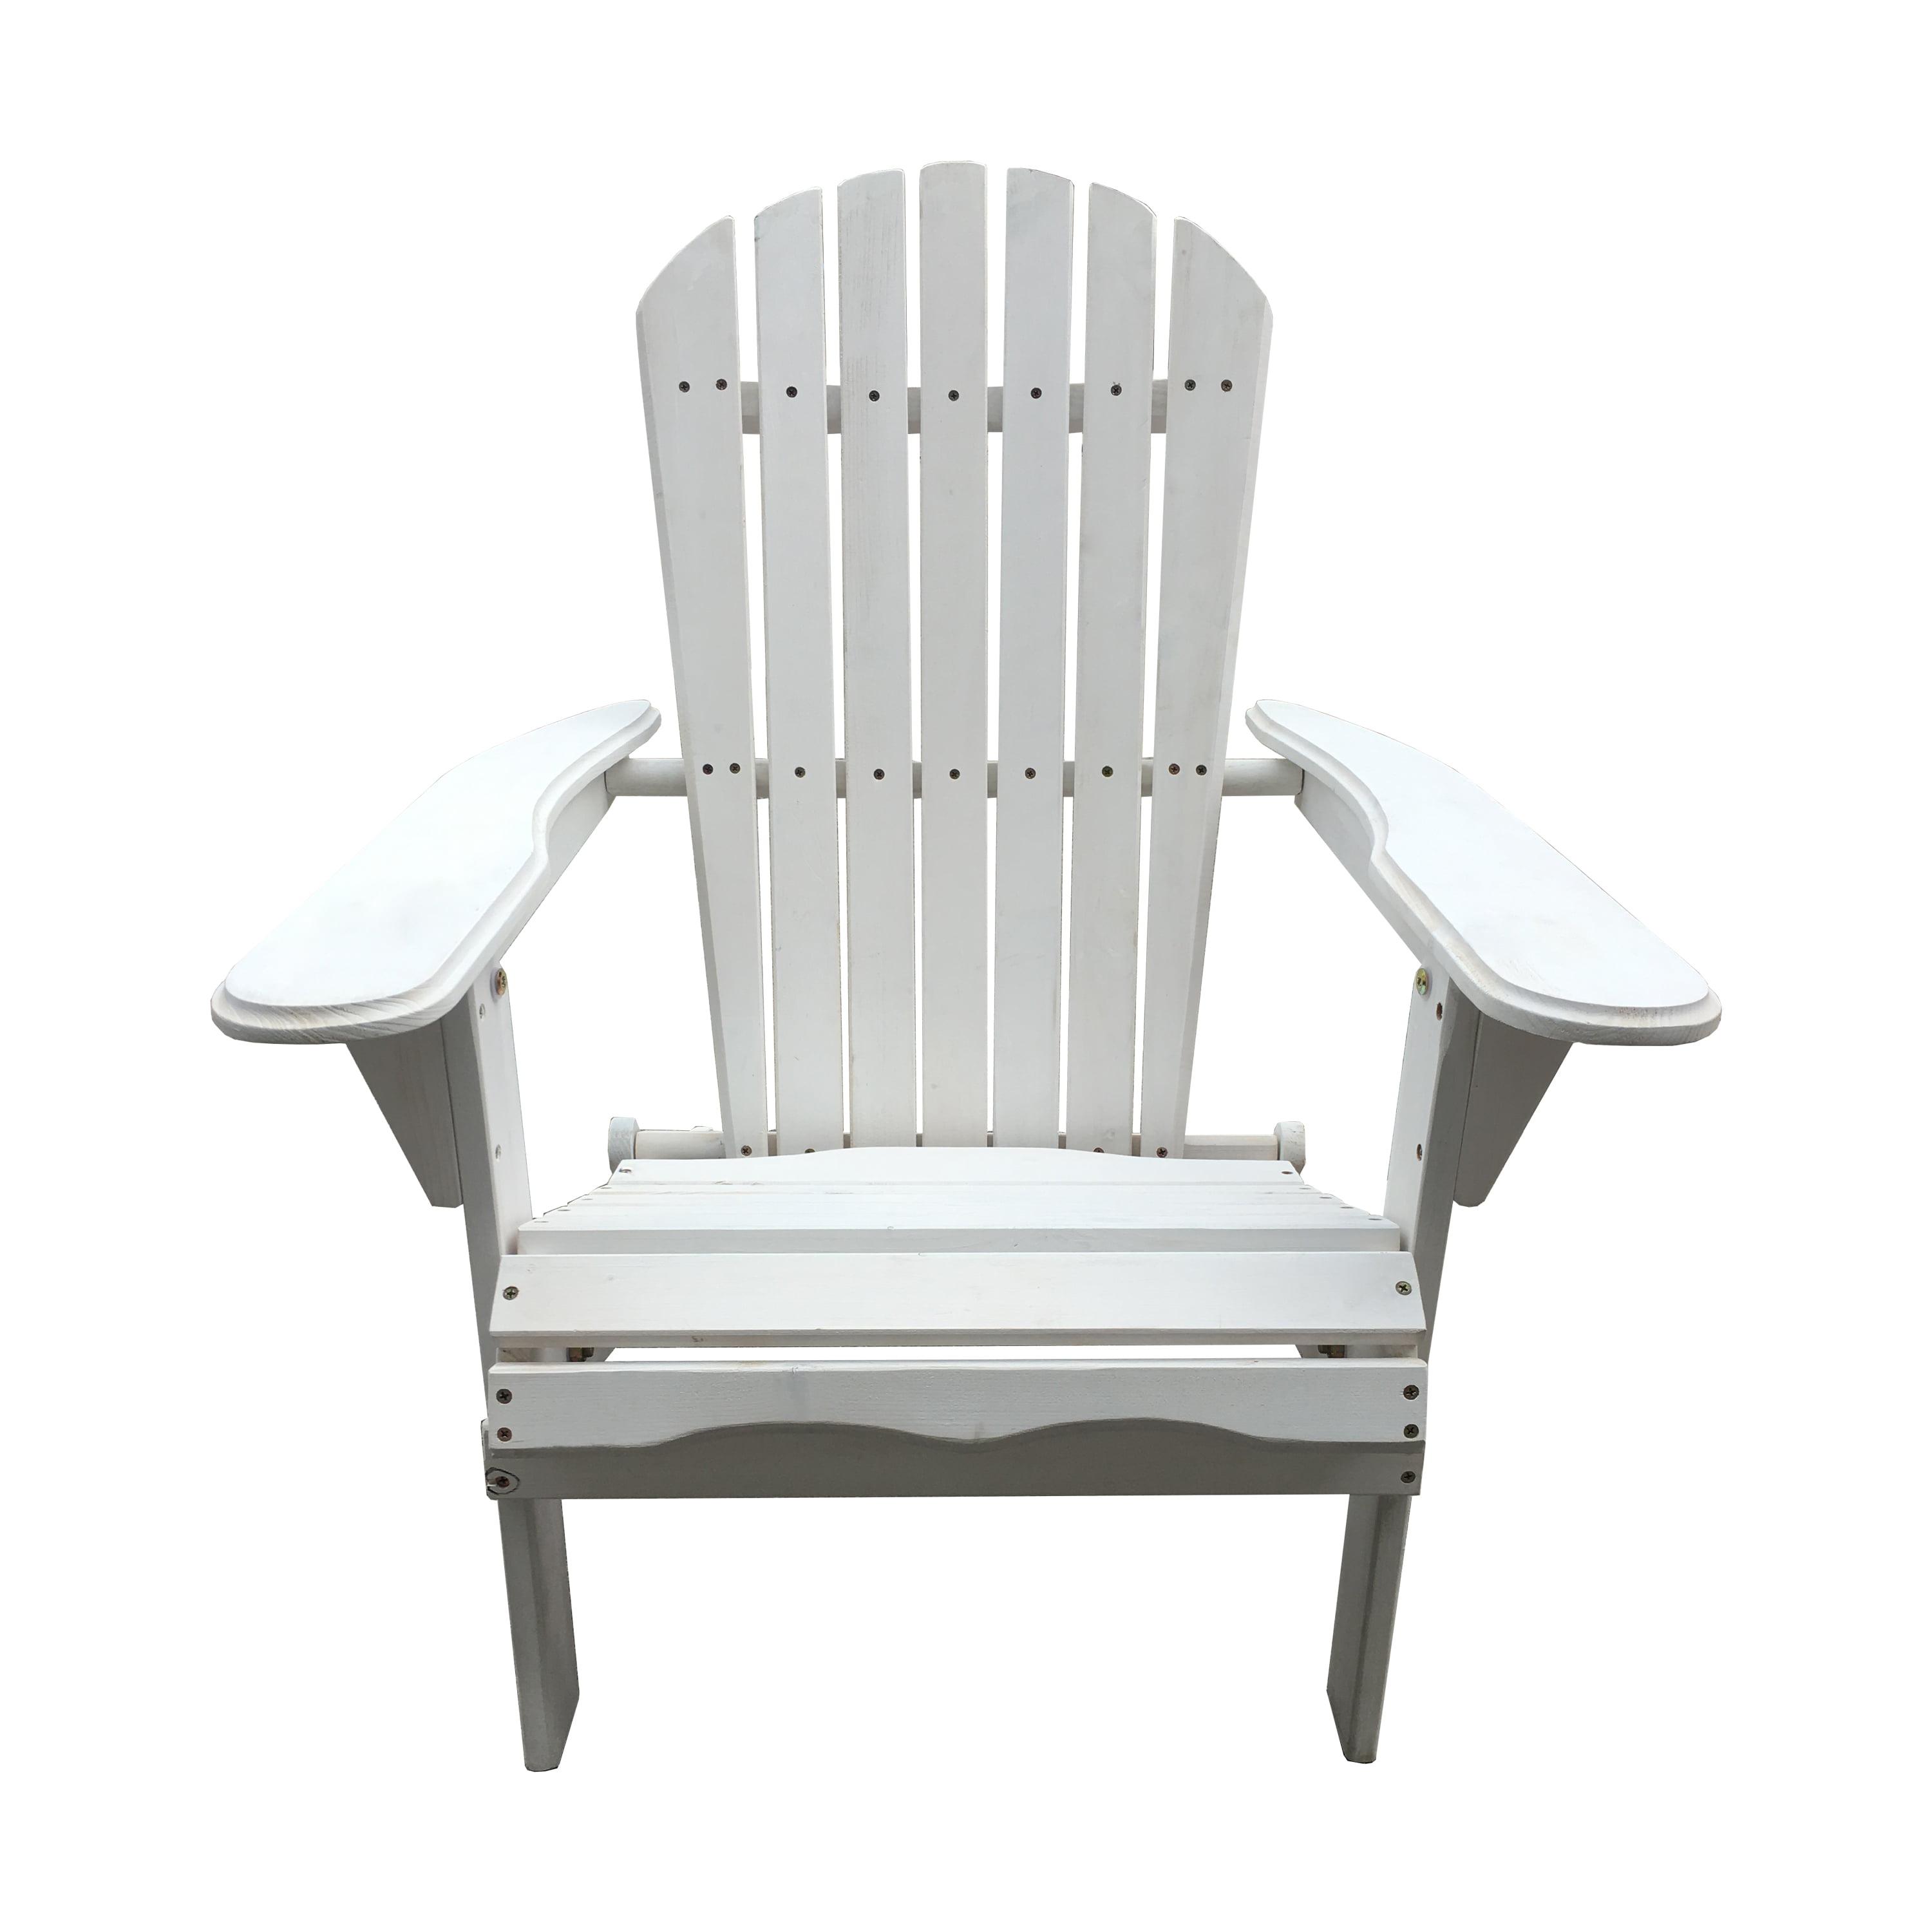 Incadozo Foldable Adirondack Chair, White